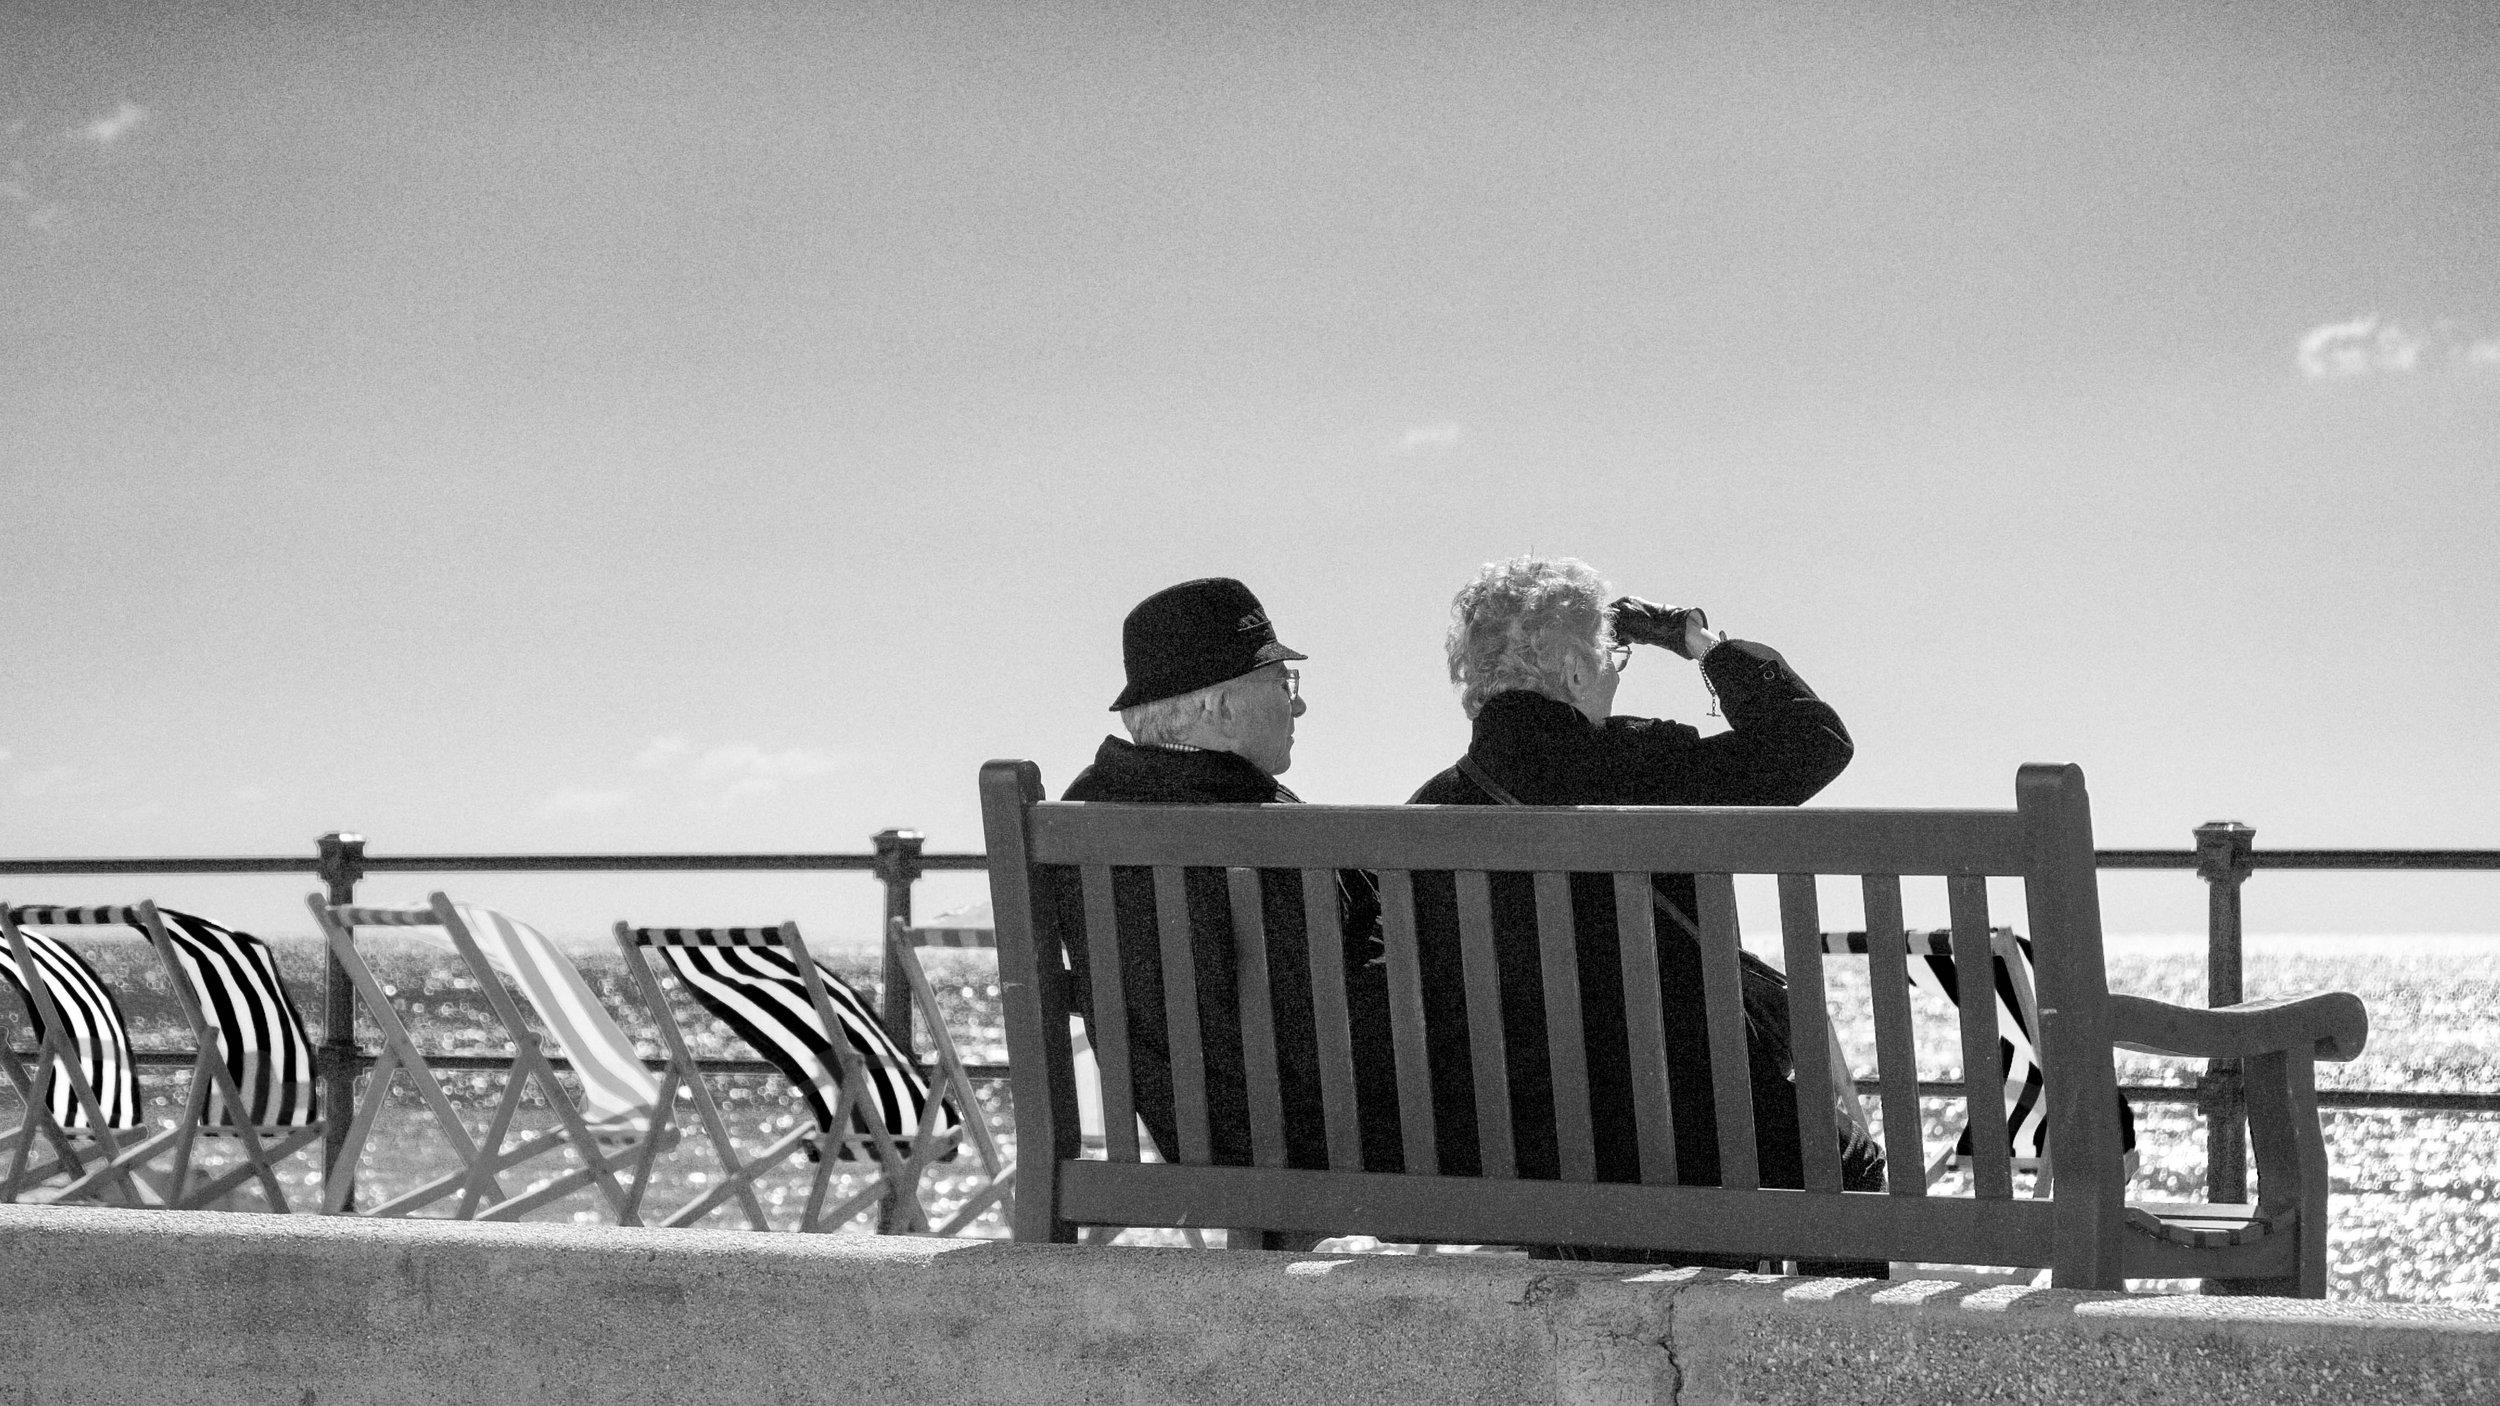 man-beach-sea-coast-black-and-white-people-630964-pxhere.com.jpg